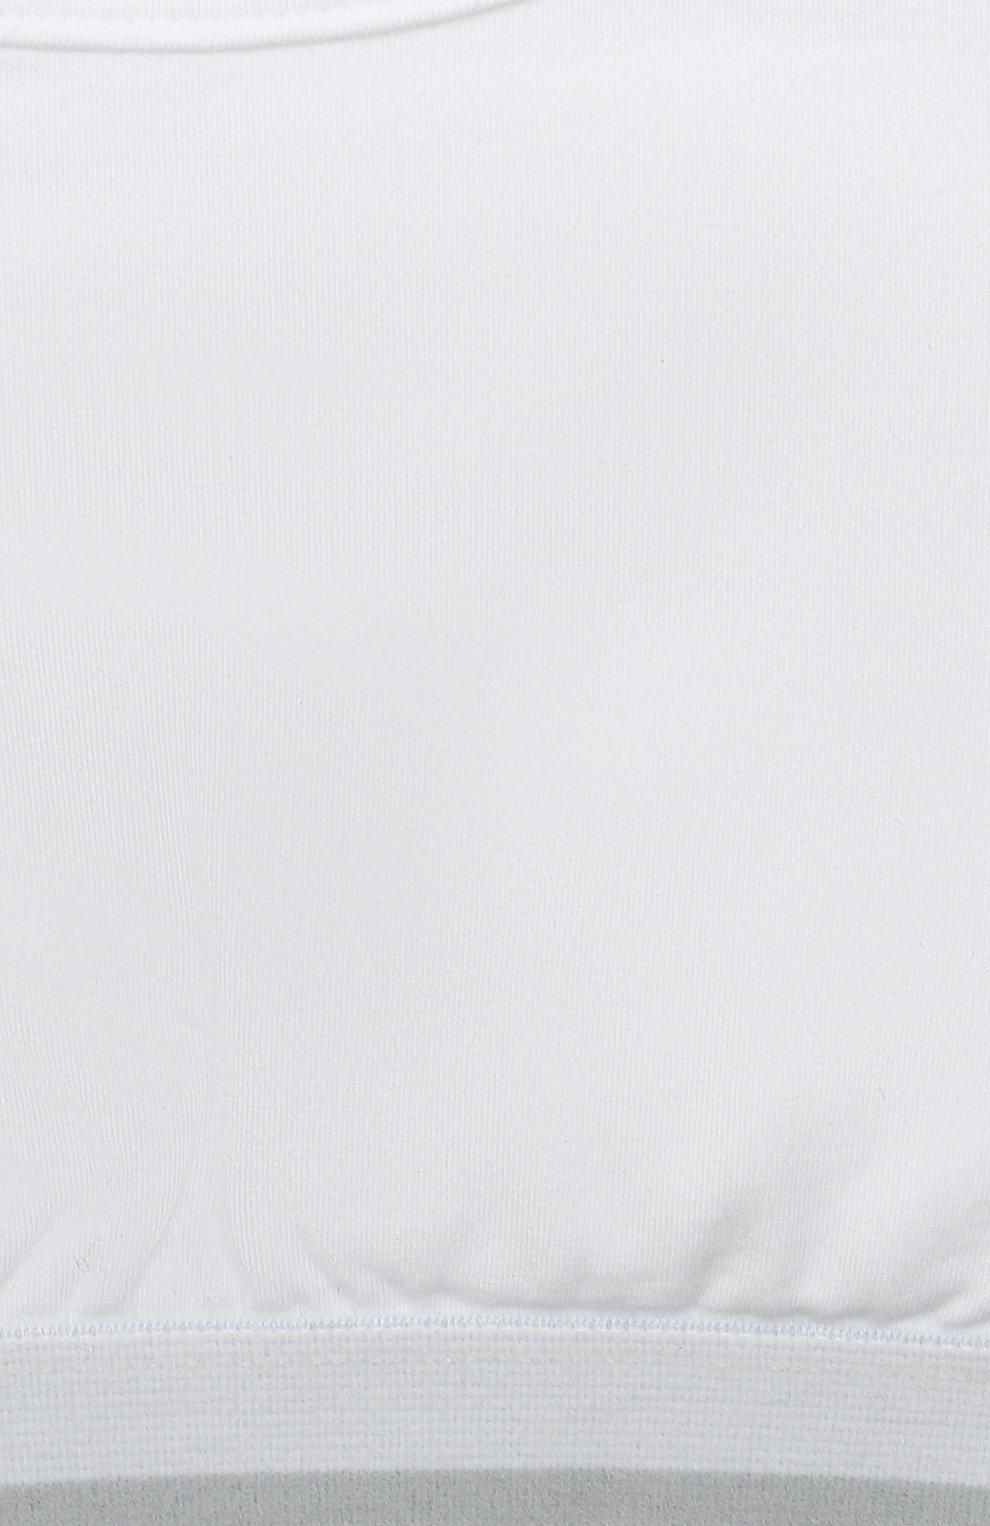 Детский бра-топ SANETTA белого цвета, арт. 346630. | Фото 3